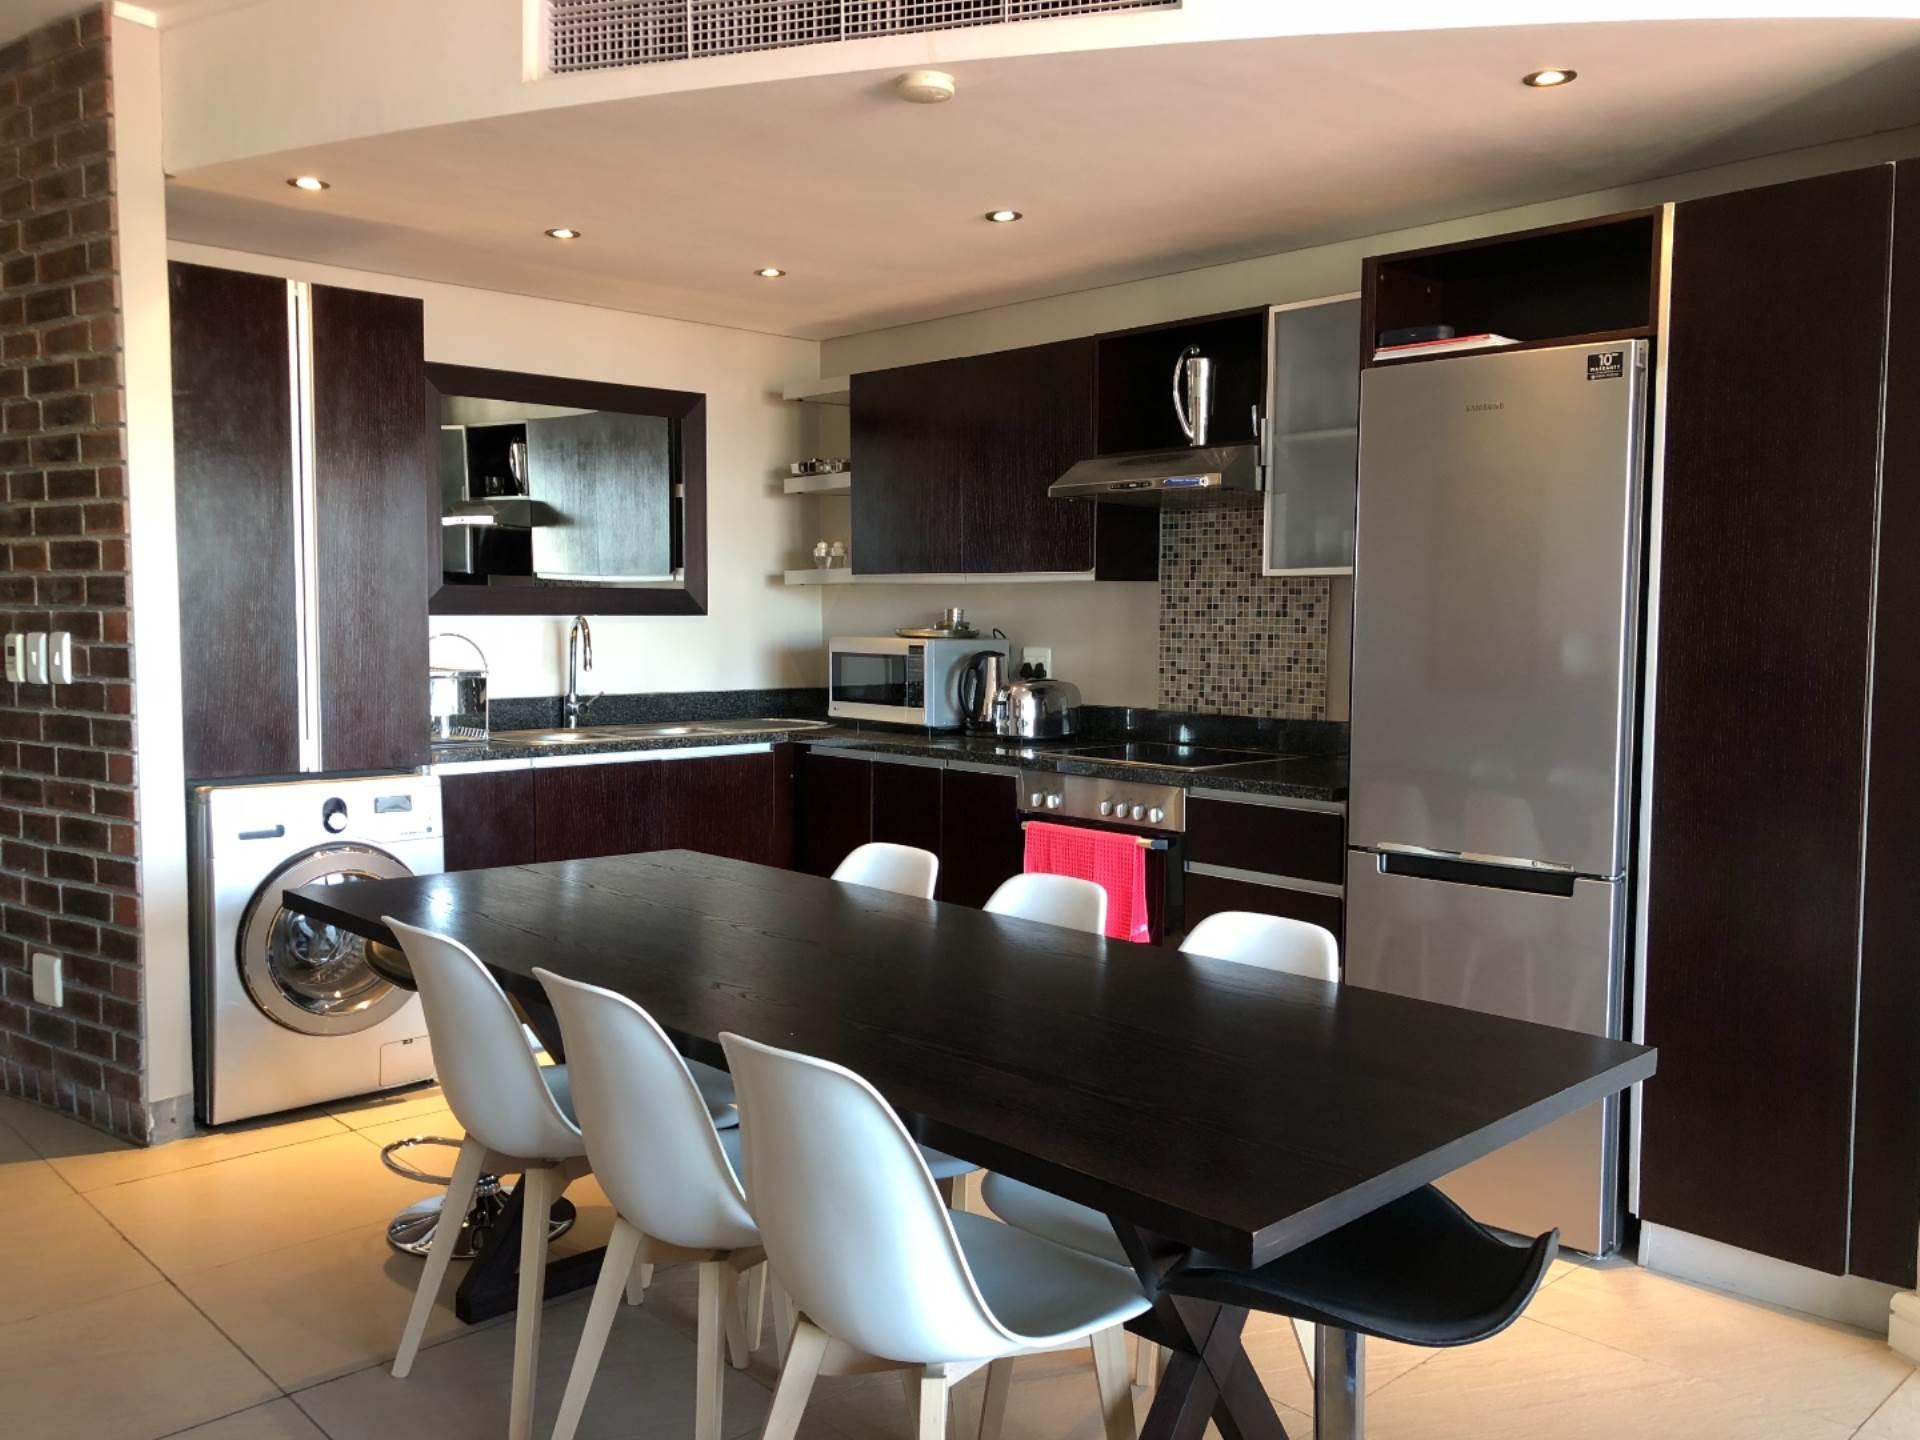 De Waterkant property for sale. Ref No: 13569708. Picture no 7